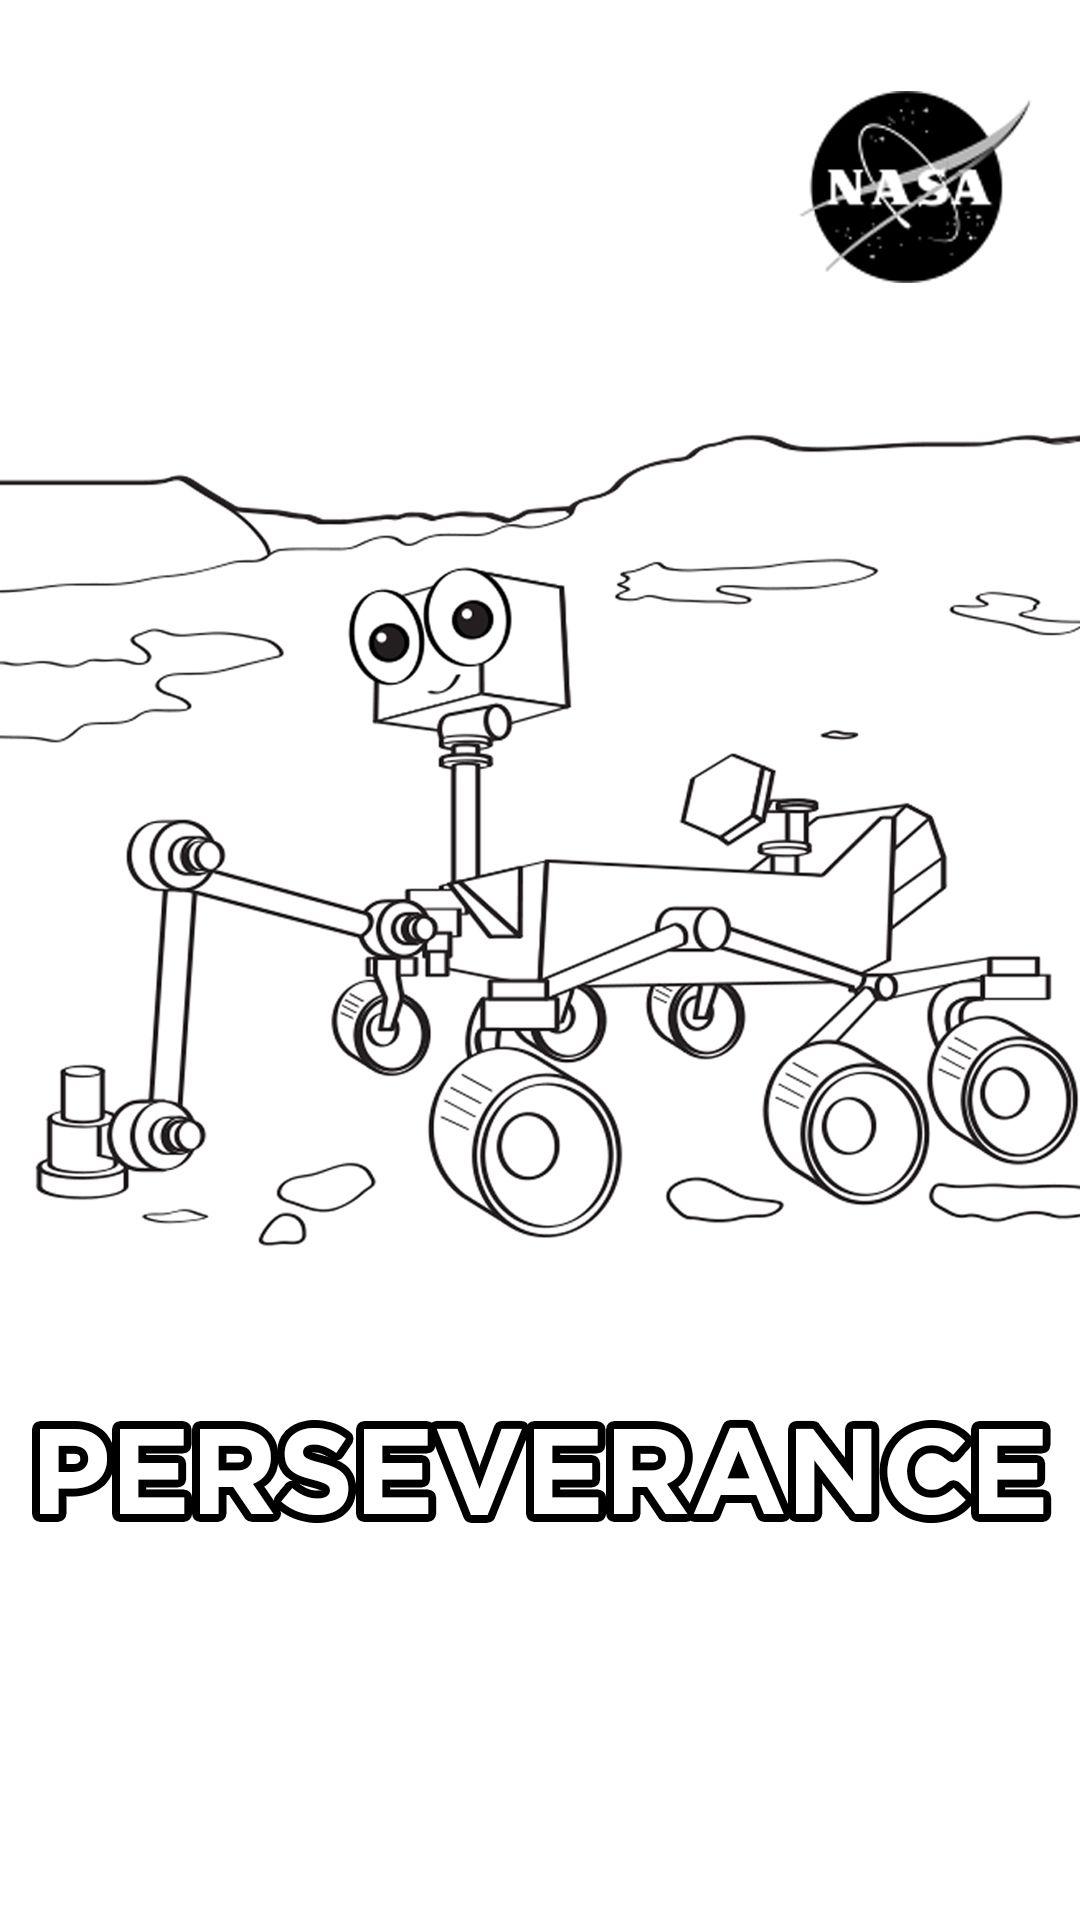 Mars Perseverance Rover In 2020 Perseverance Microbial Life Nasa